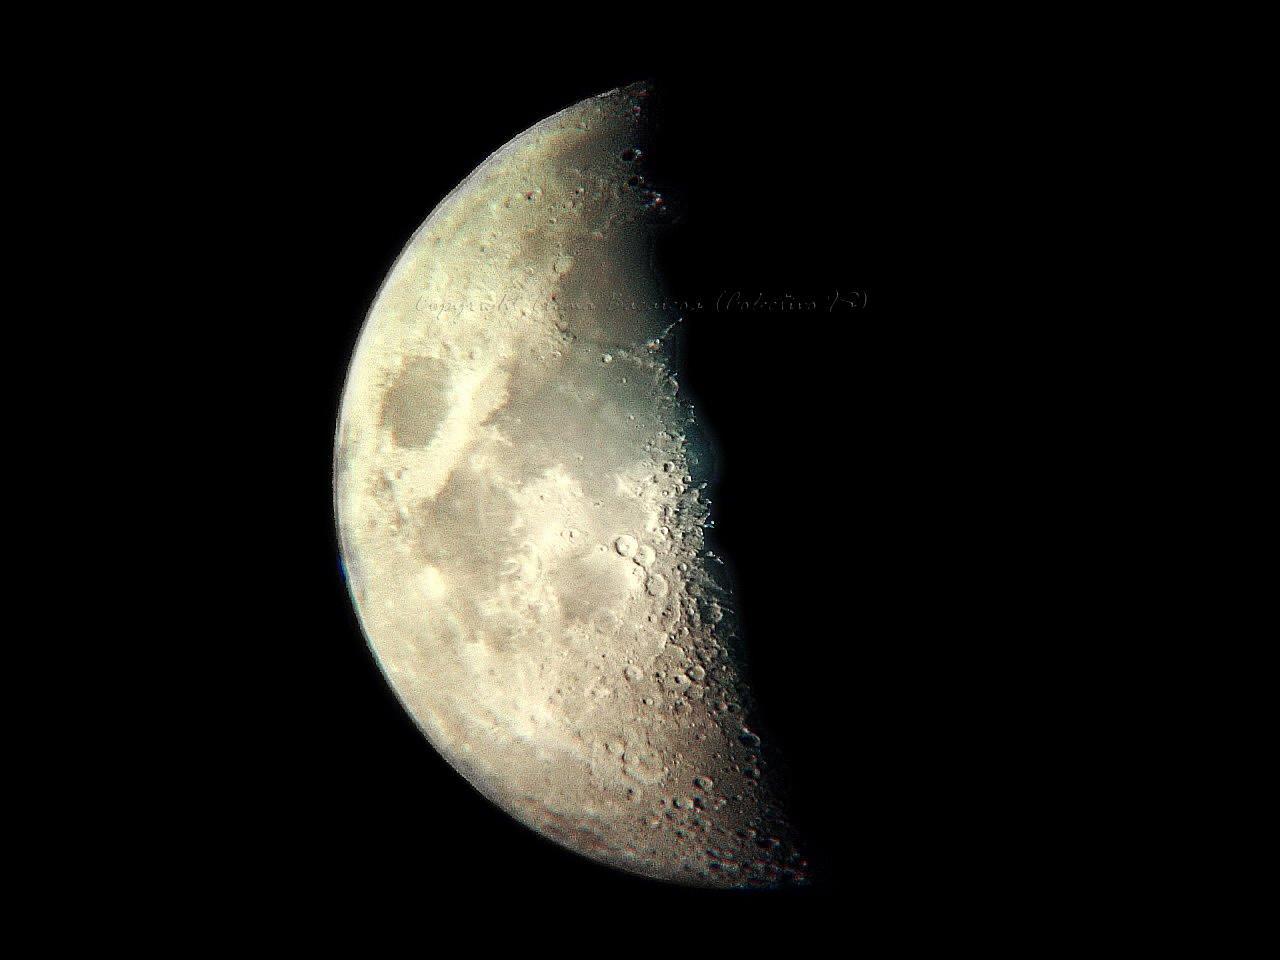 Media luna (Txema Bacaicoa (Colectivo IS))